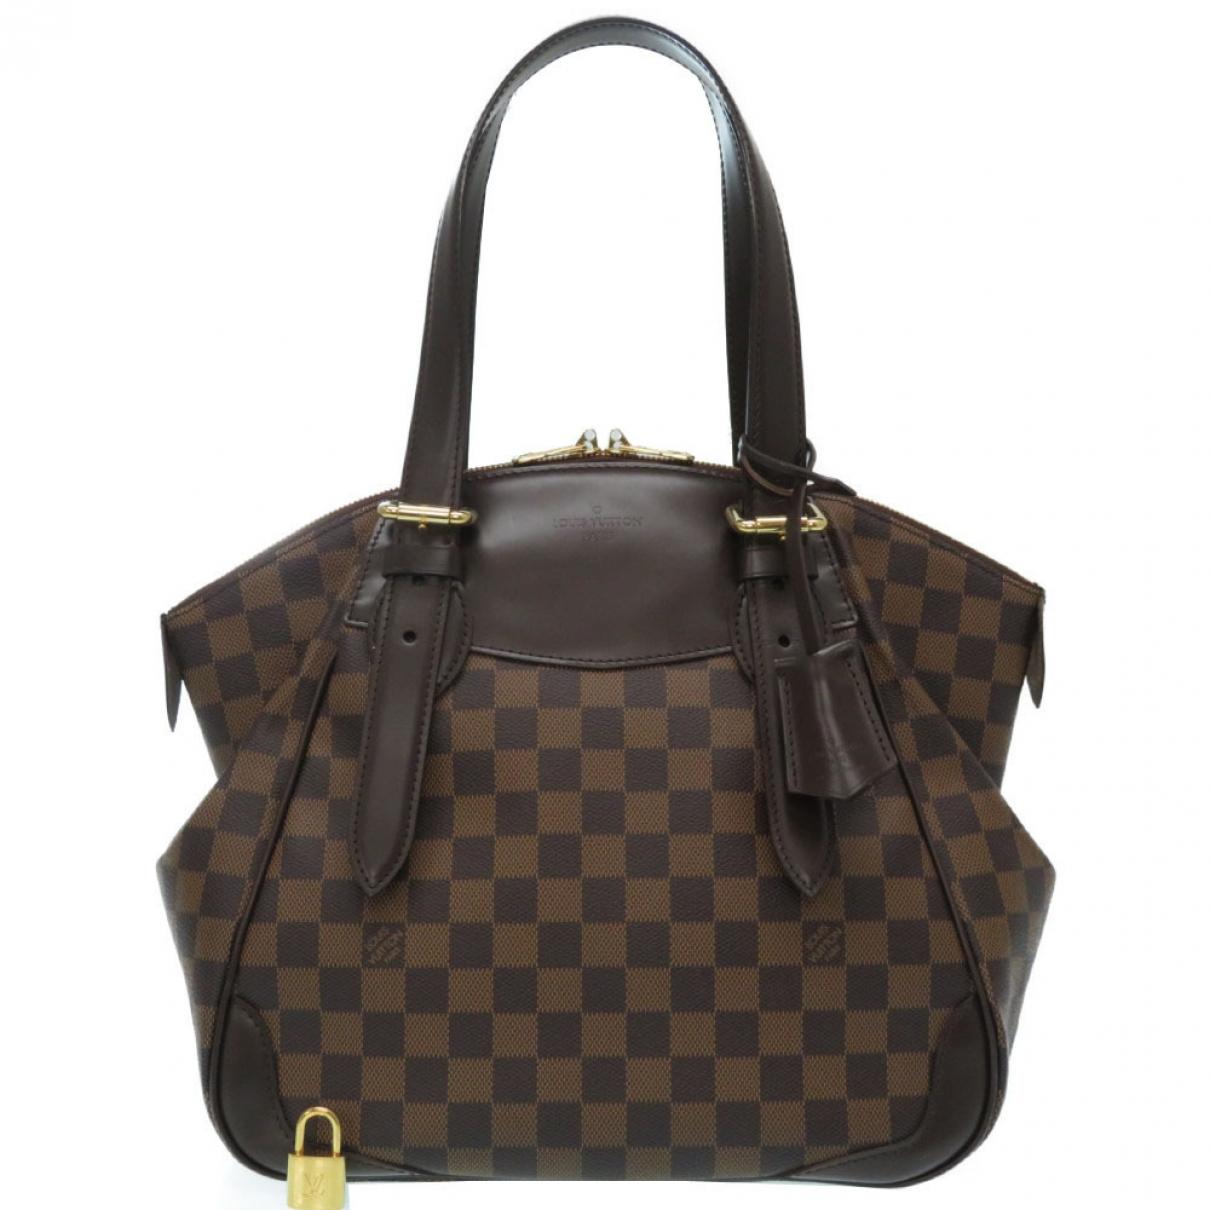 Louis Vuitton - Sac a main Verona pour femme en toile - marron